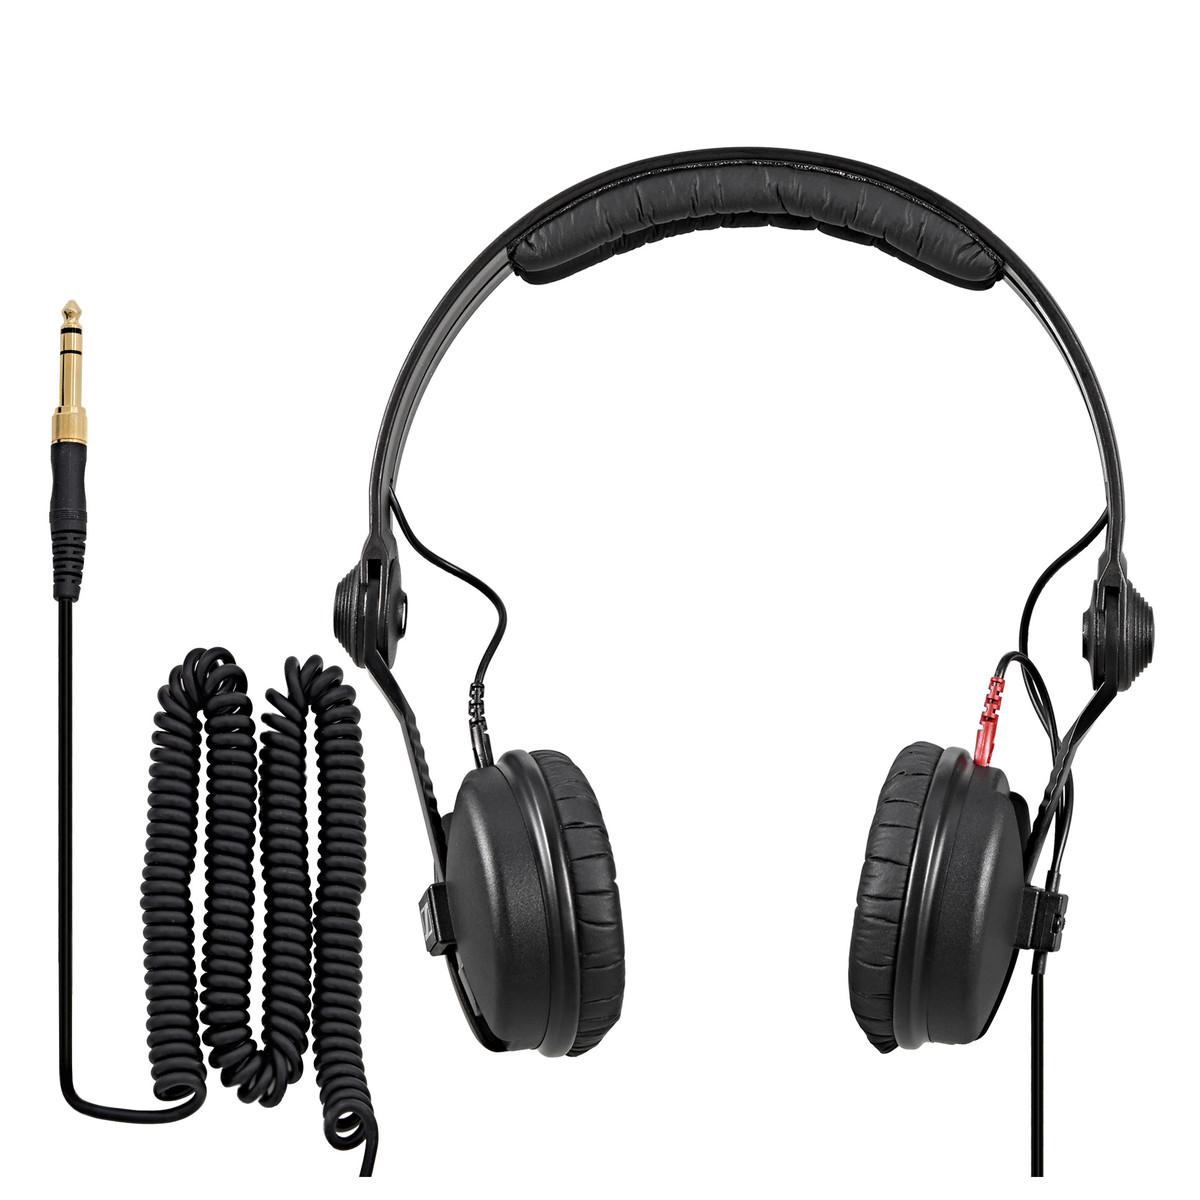 sennheiser hd 25 plus headphones b stock at gear4music. Black Bedroom Furniture Sets. Home Design Ideas